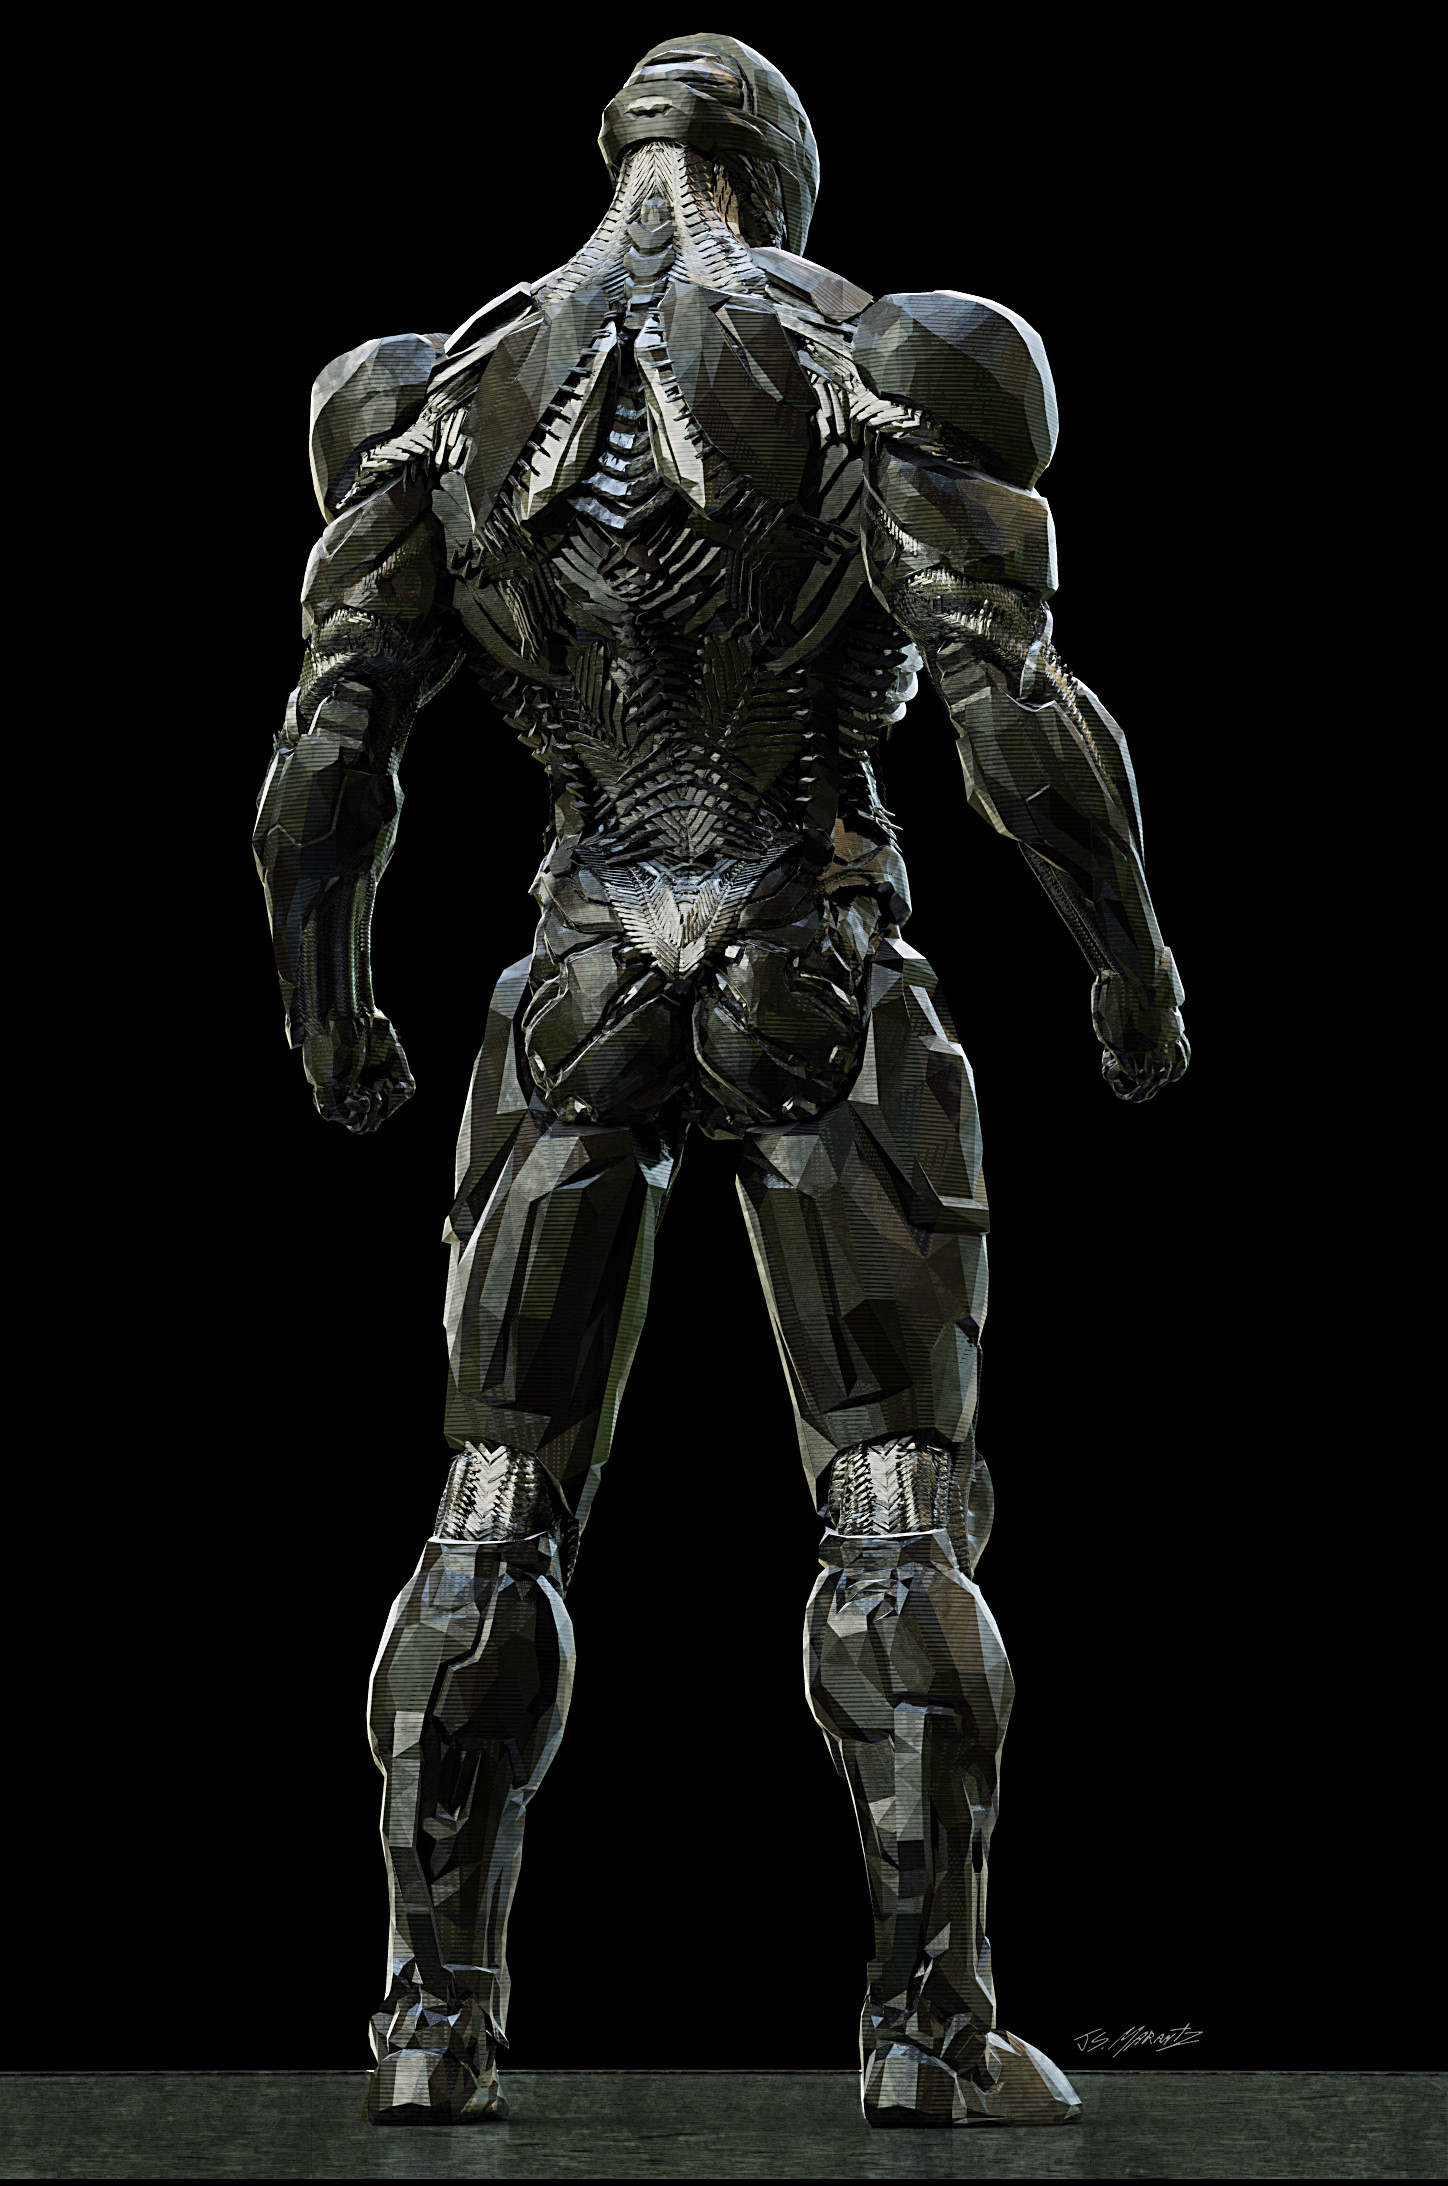 Jerx marantz cyborg pass 4 full back revision1 bands